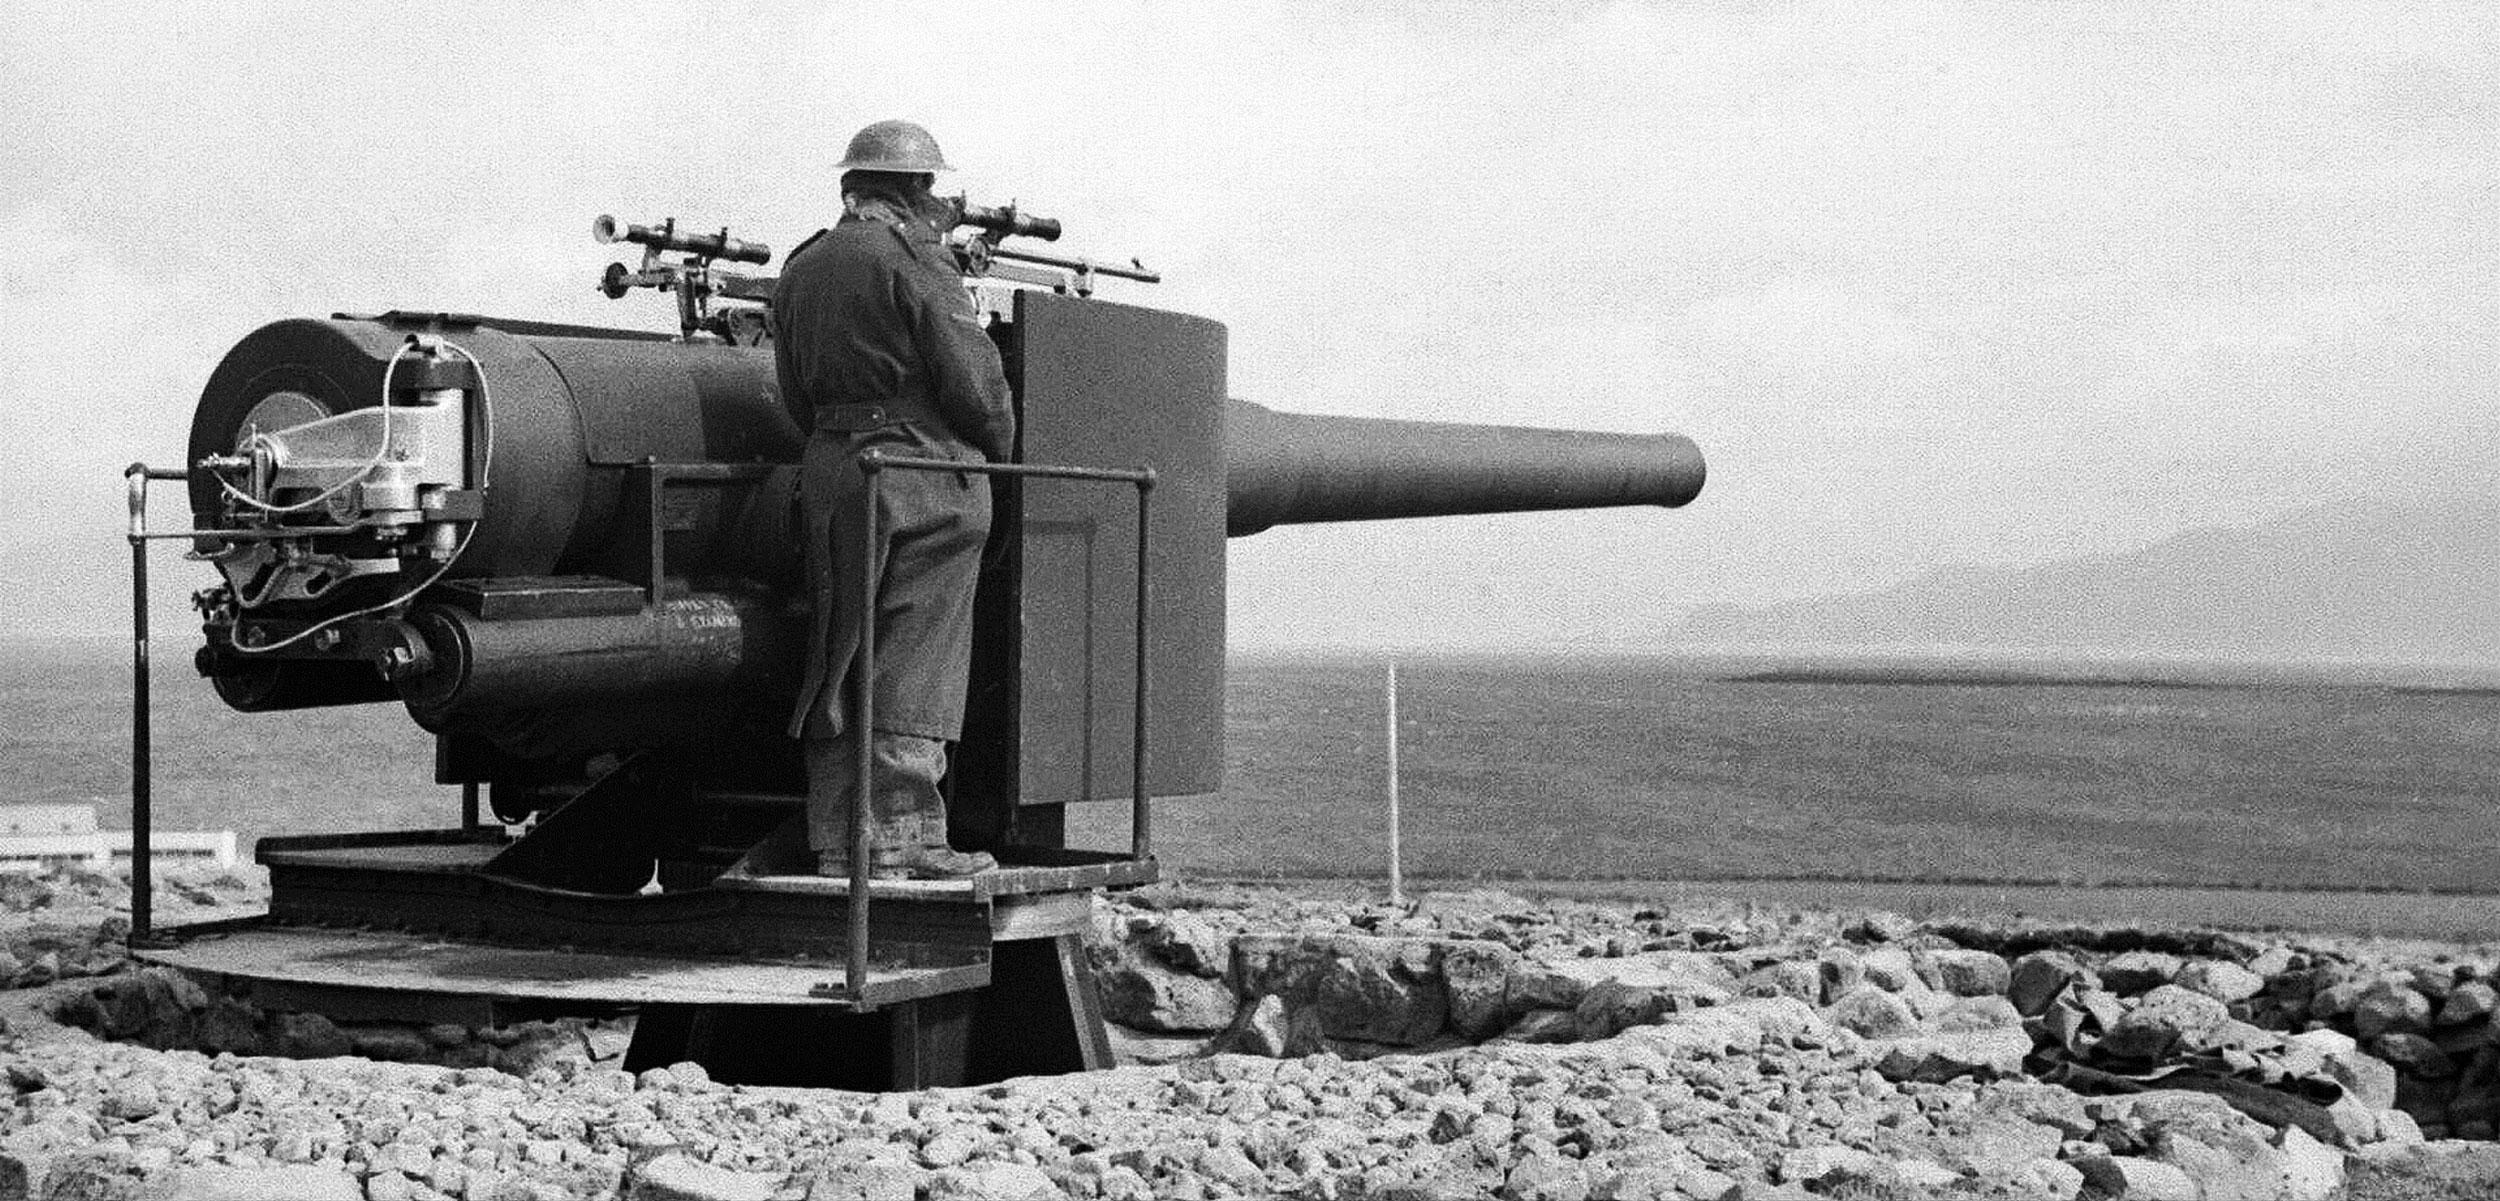 6-inch naval gun overlooking Reykjavik Bay in Iceland, 1940